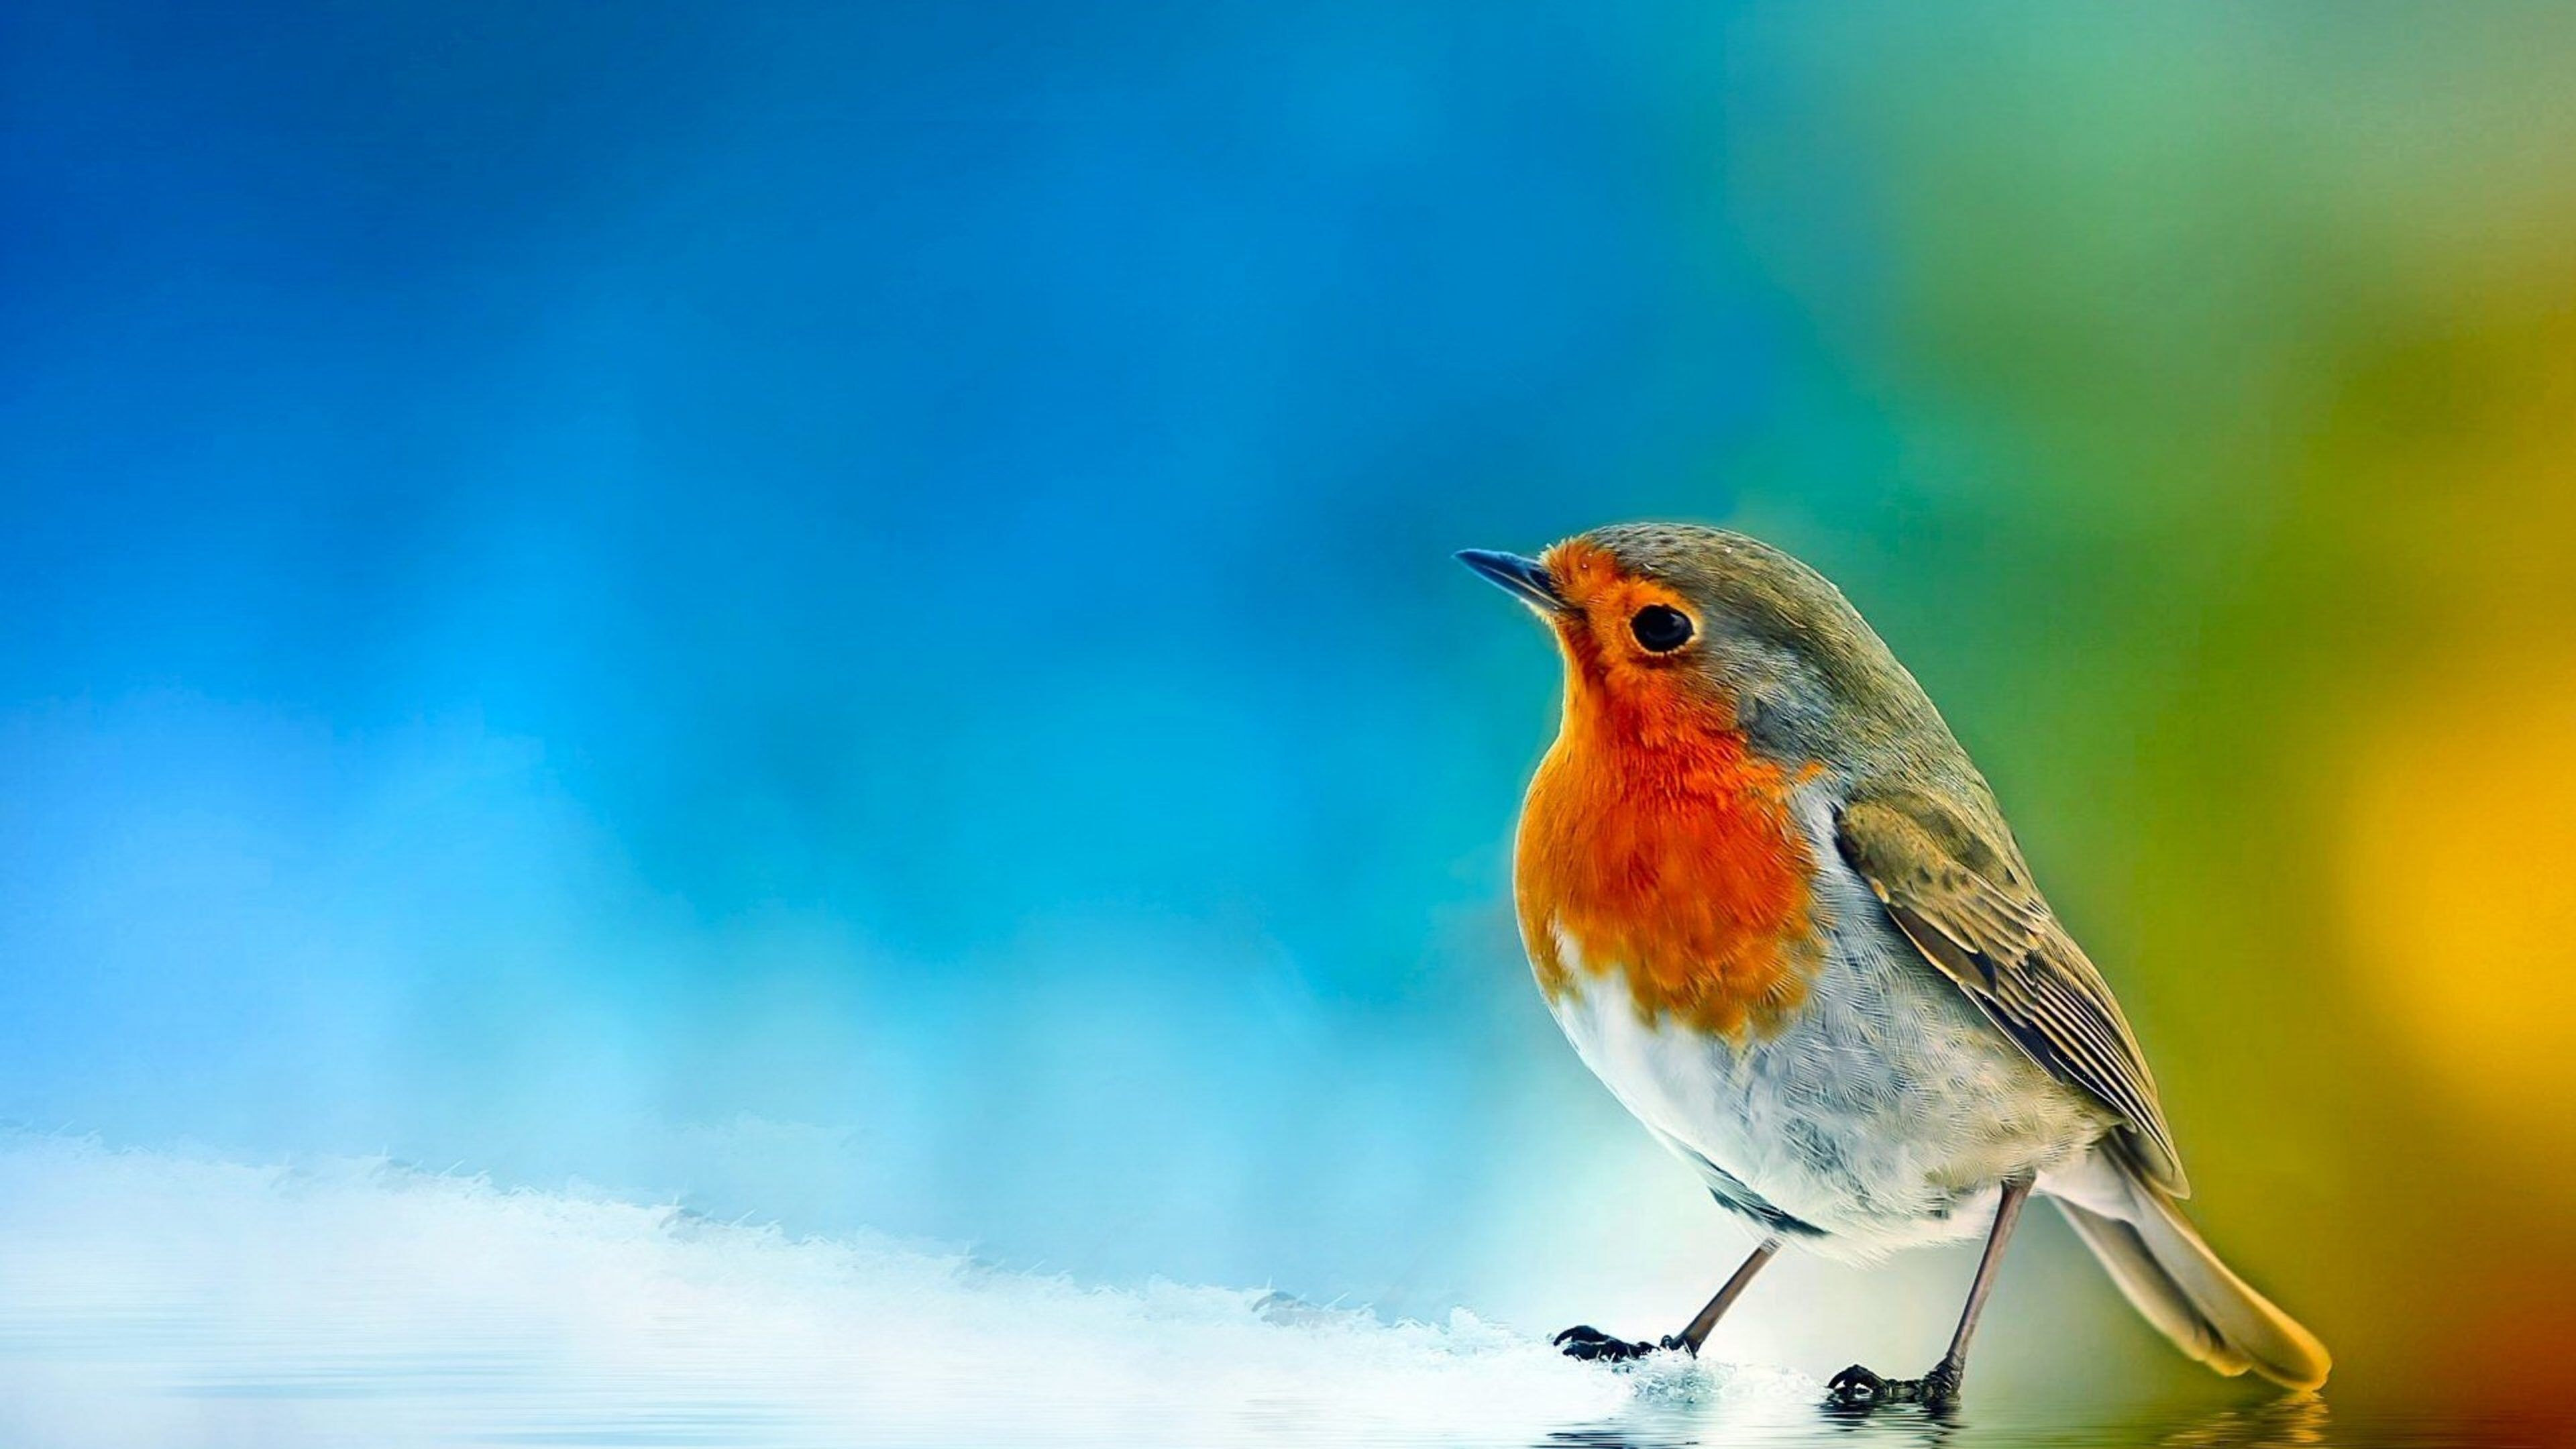 New Birds Pictures Hd Hd Wallpapers Birds Wallpaper Hd Bird Wallpaper Bird Pictures